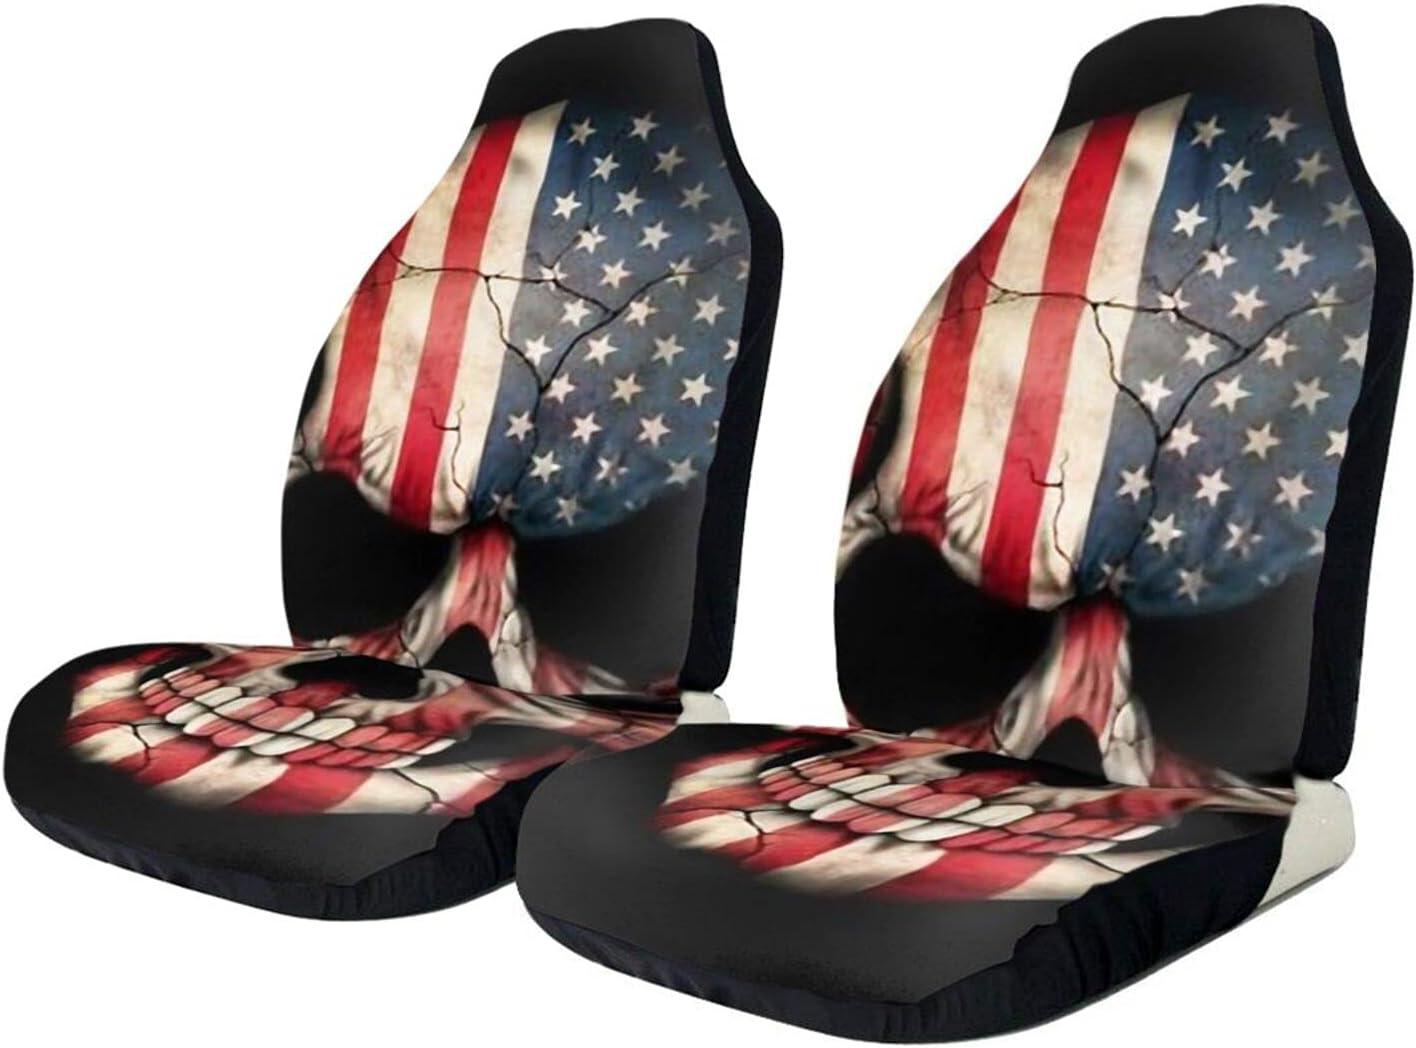 Elegant Auto Car Seat Covers Vintage Cov American Flag Bucket Skull Popular product